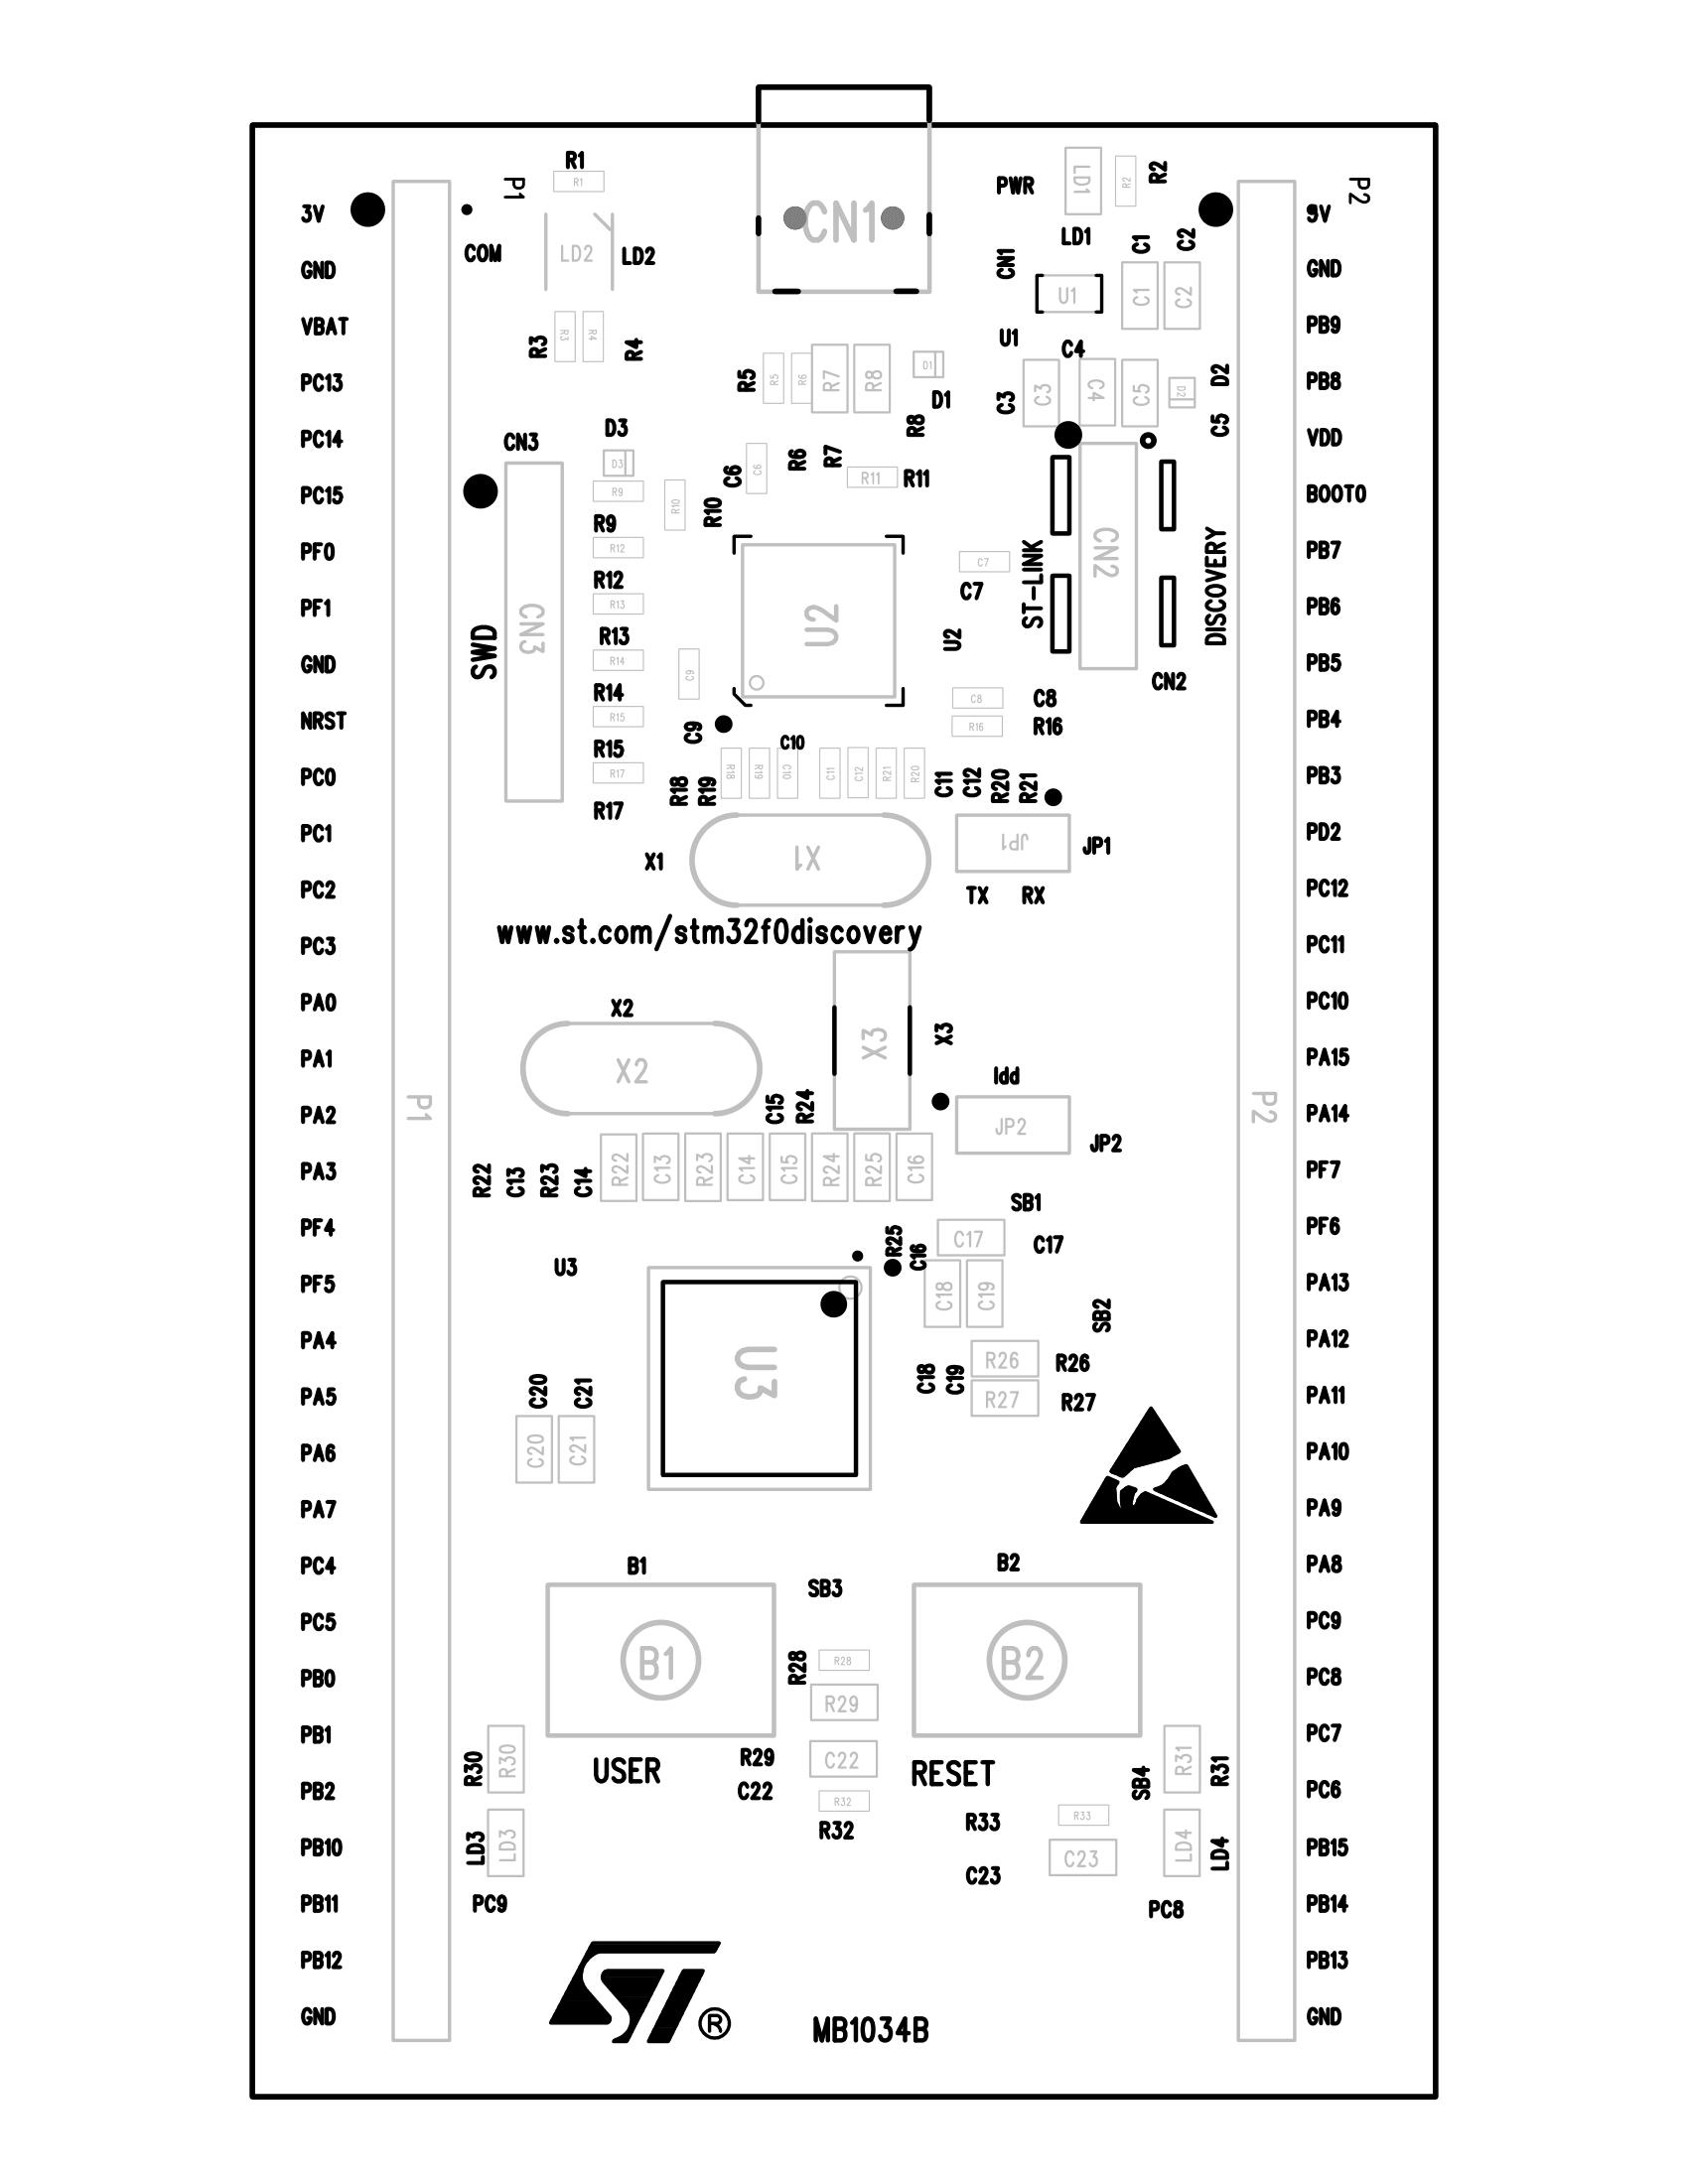 corolla wiring diagram besides ford galaxy mk2 fuse box furthermore triumph bonneville t100 [ 1700 x 2200 Pixel ]